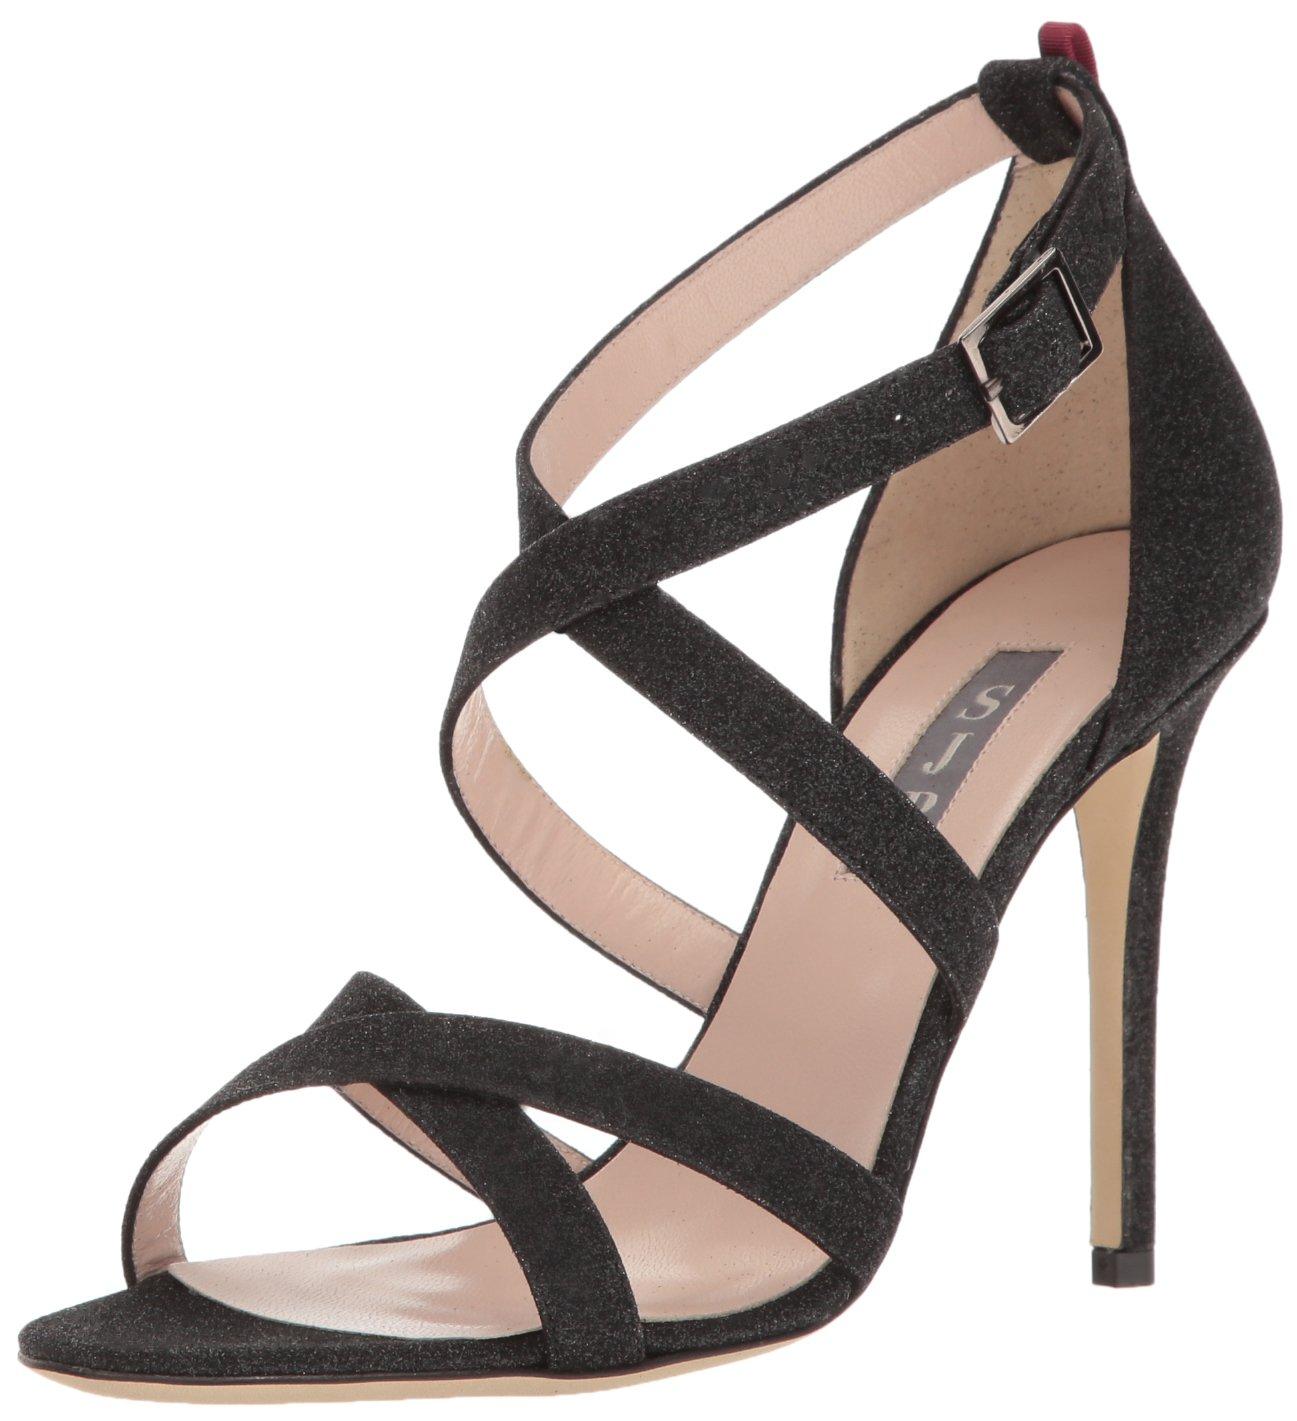 SJP by Sarah Jessica Parker Women's Strut Dress Sandal, Doozy Fine Glitter Black, 39 EU/8.5 B US